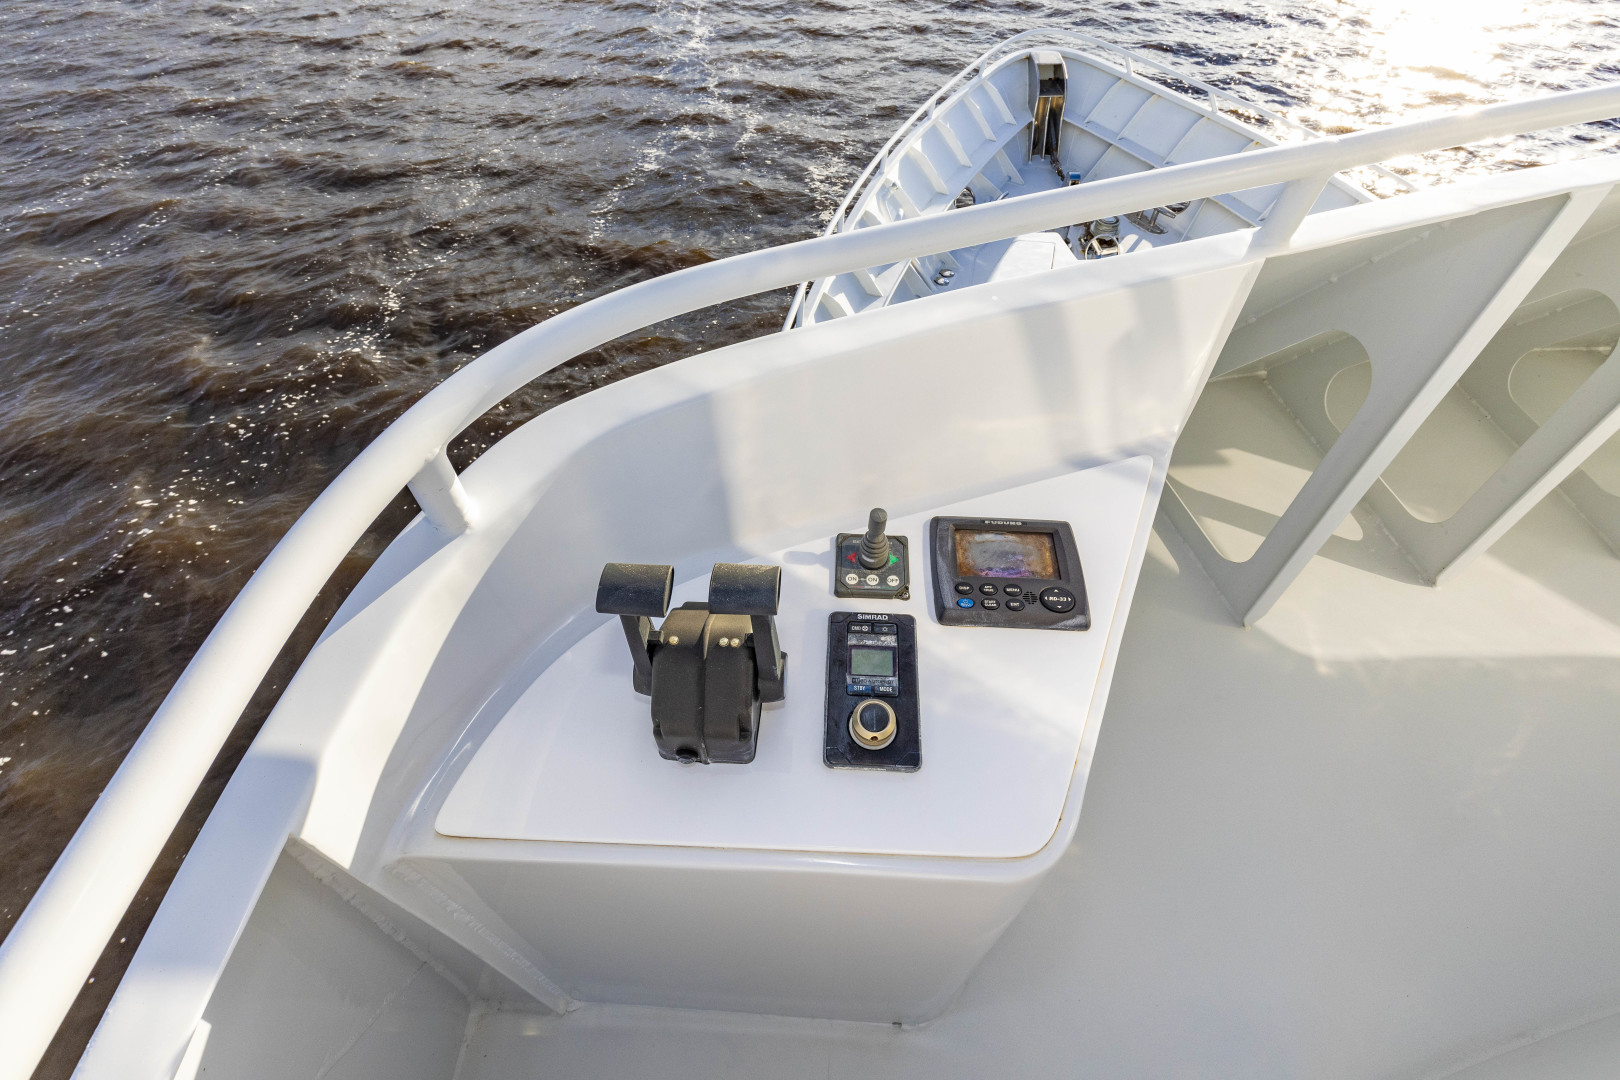 GlassTech-Expedition Yacht 2018-Reset Stuart-Florida-United States-Port Wing Controls-1568641 | Thumbnail